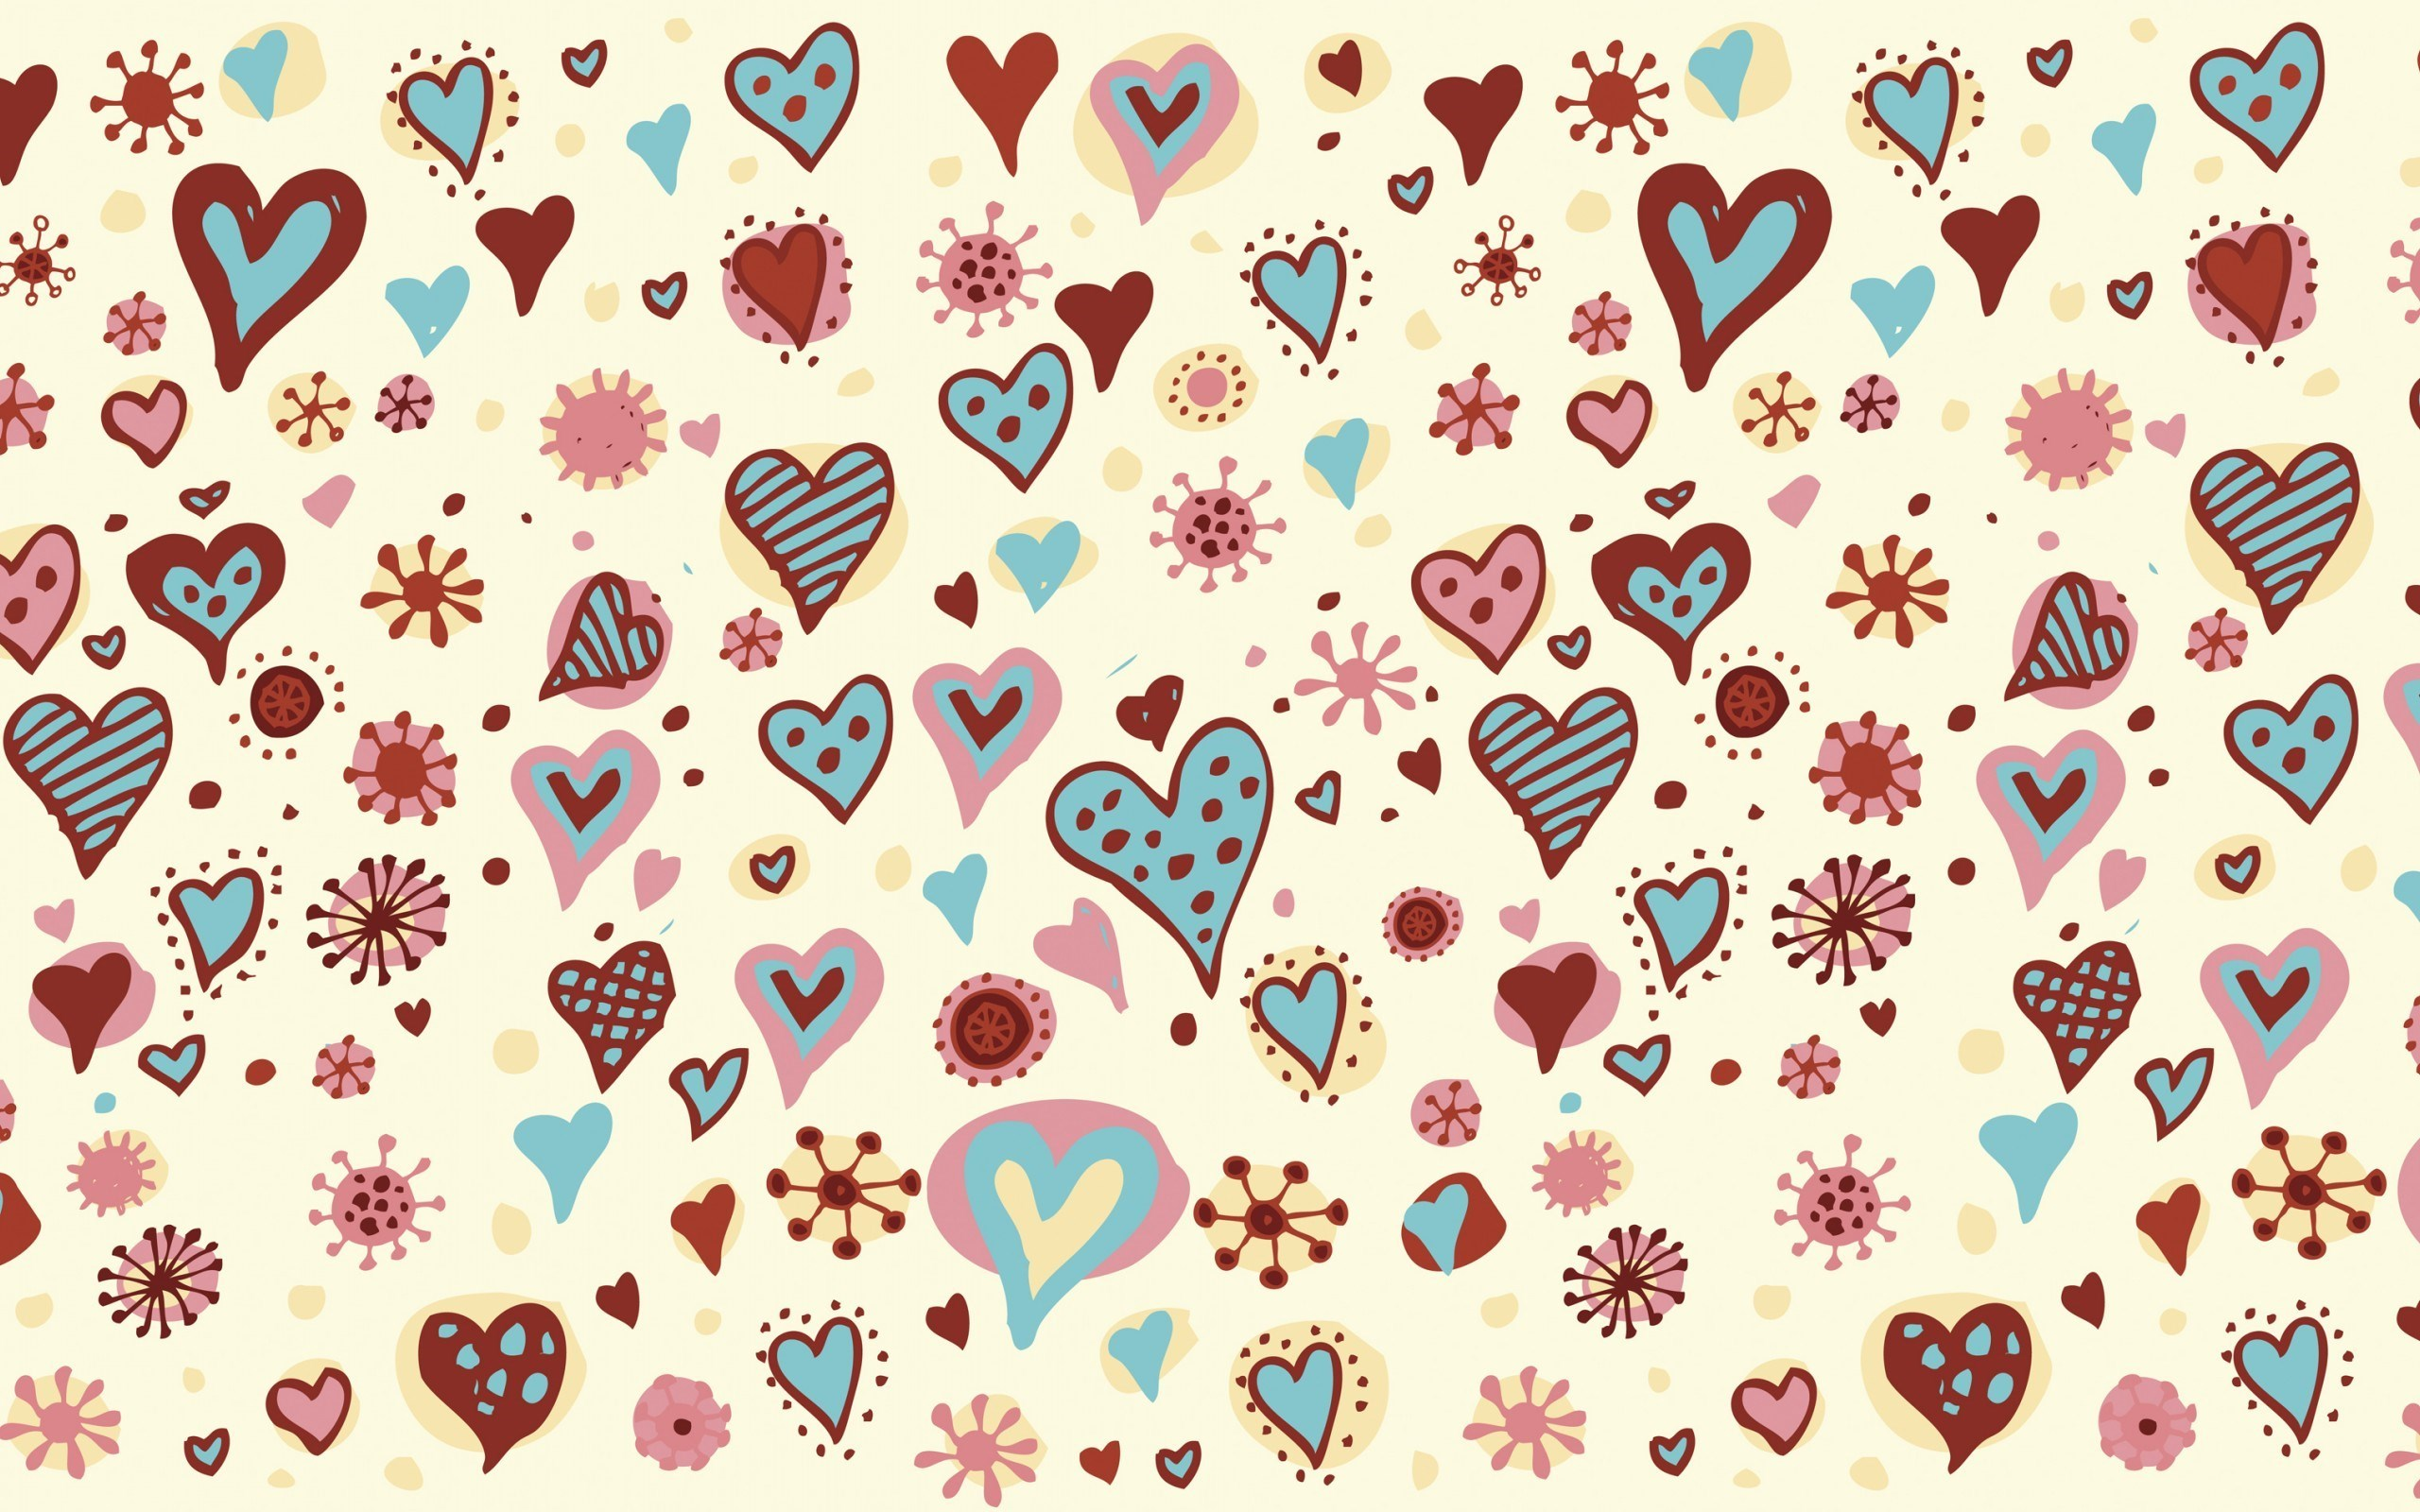 Hearts Love Texture